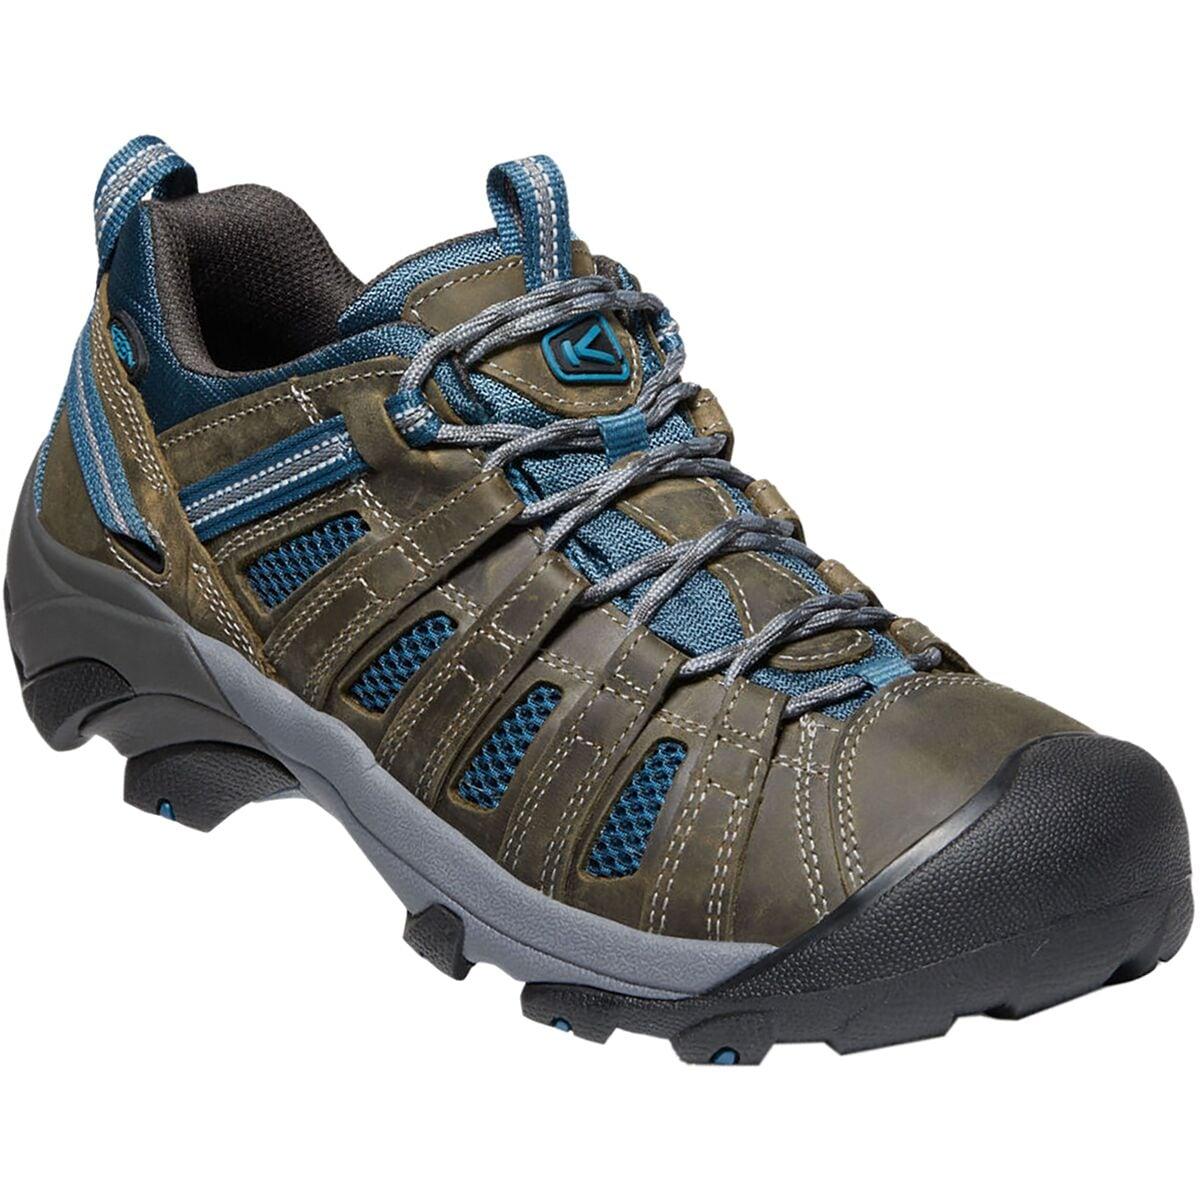 KEEN Voyageur Hiking Shoe - Men's